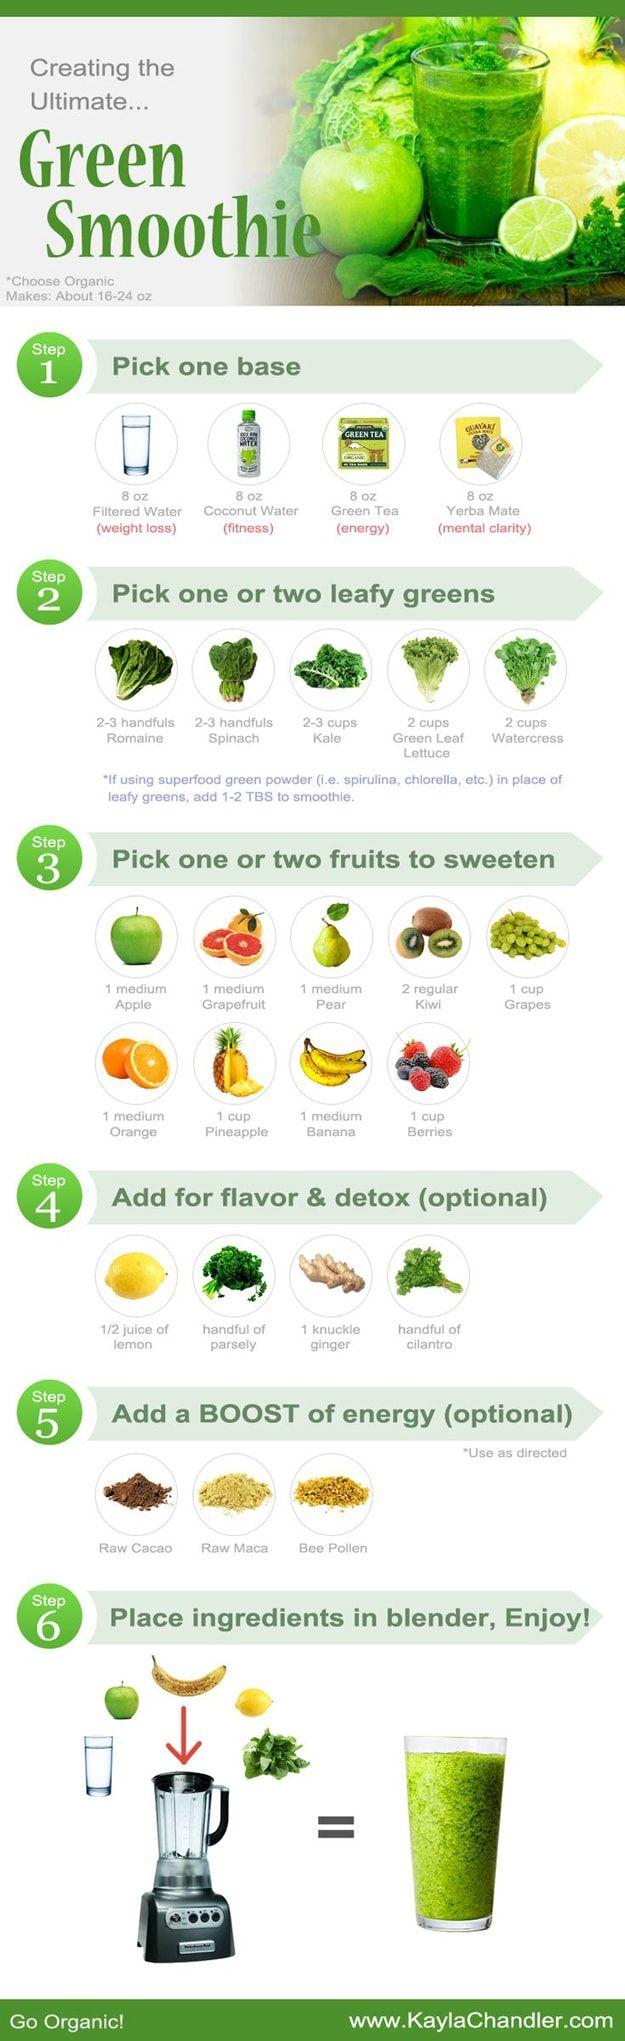 gezonde smoothies